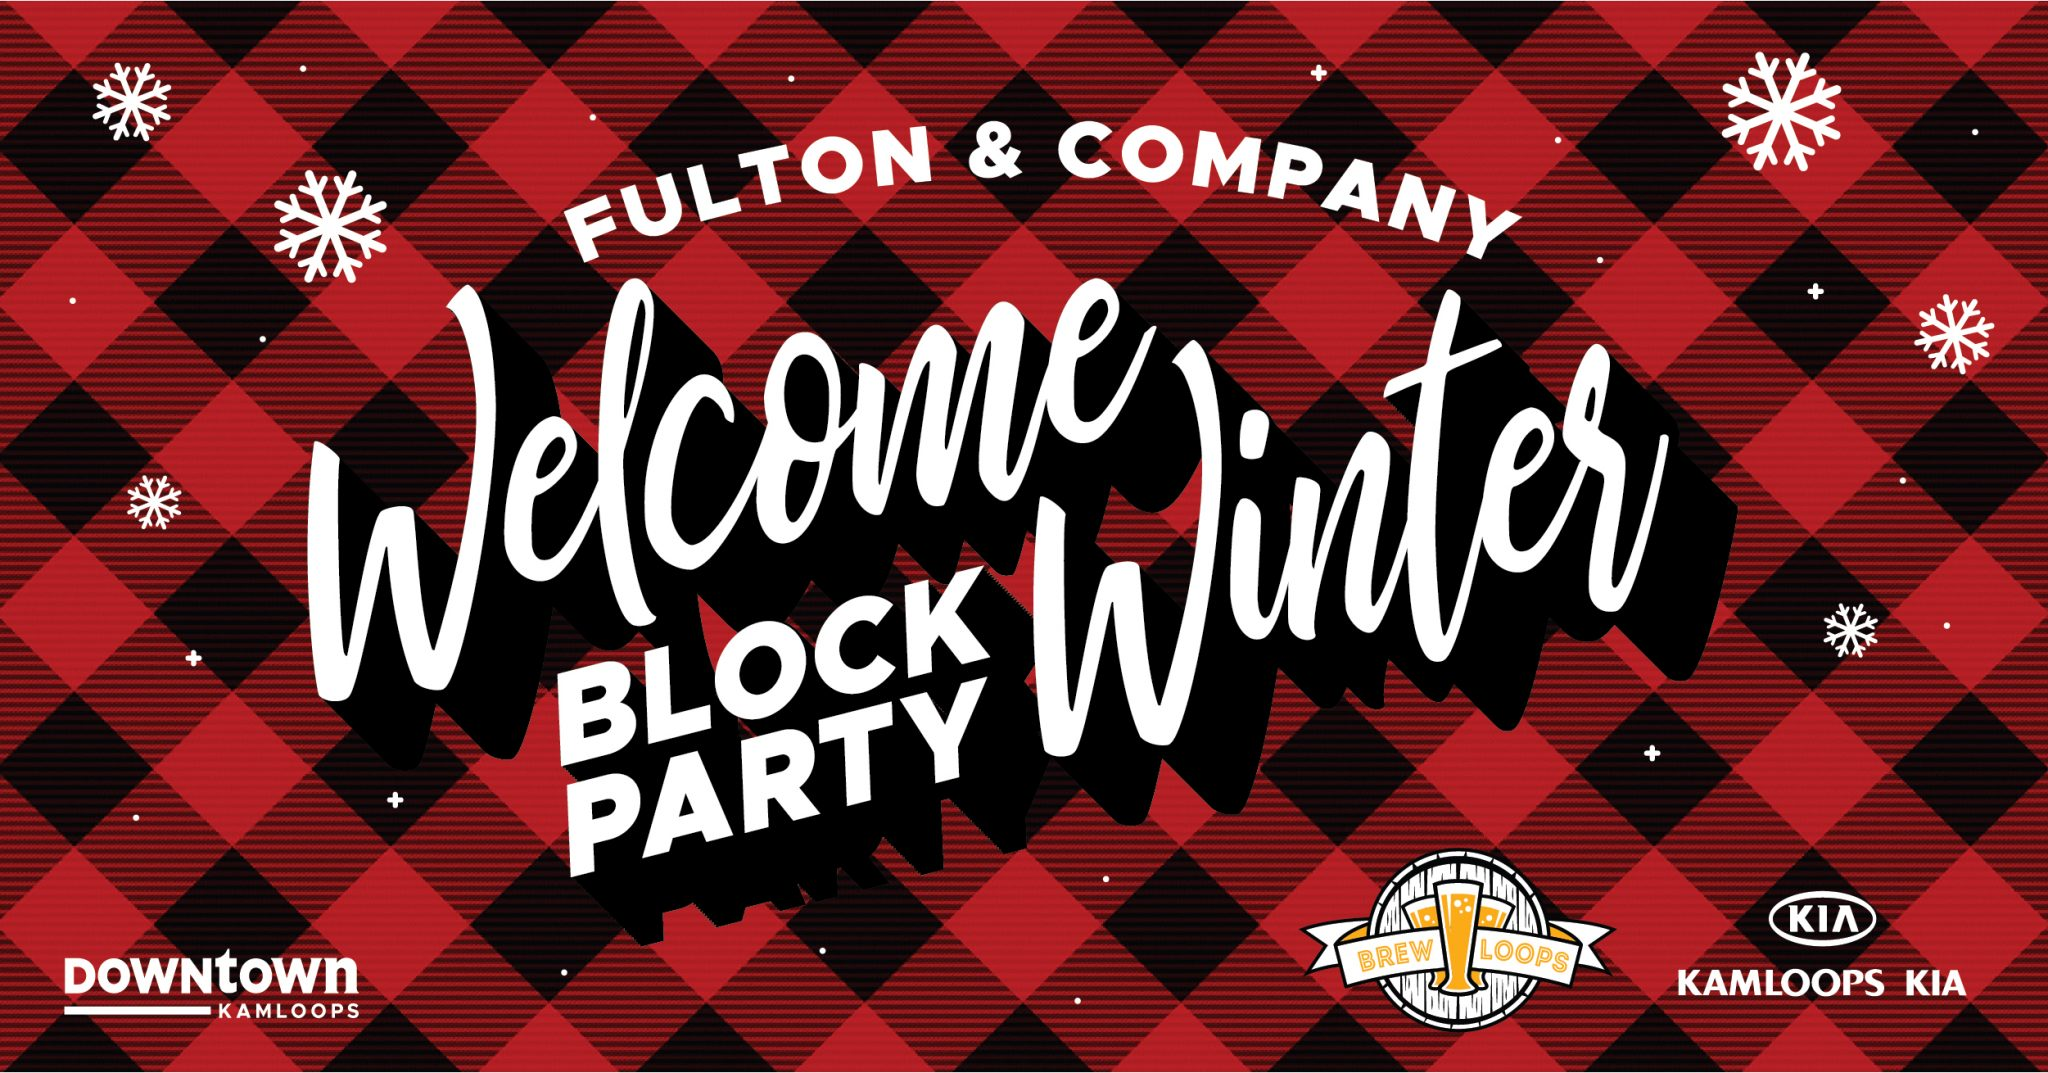 KCBIA Hosting Winter Block Party this Saturday in Downtown Kamloops